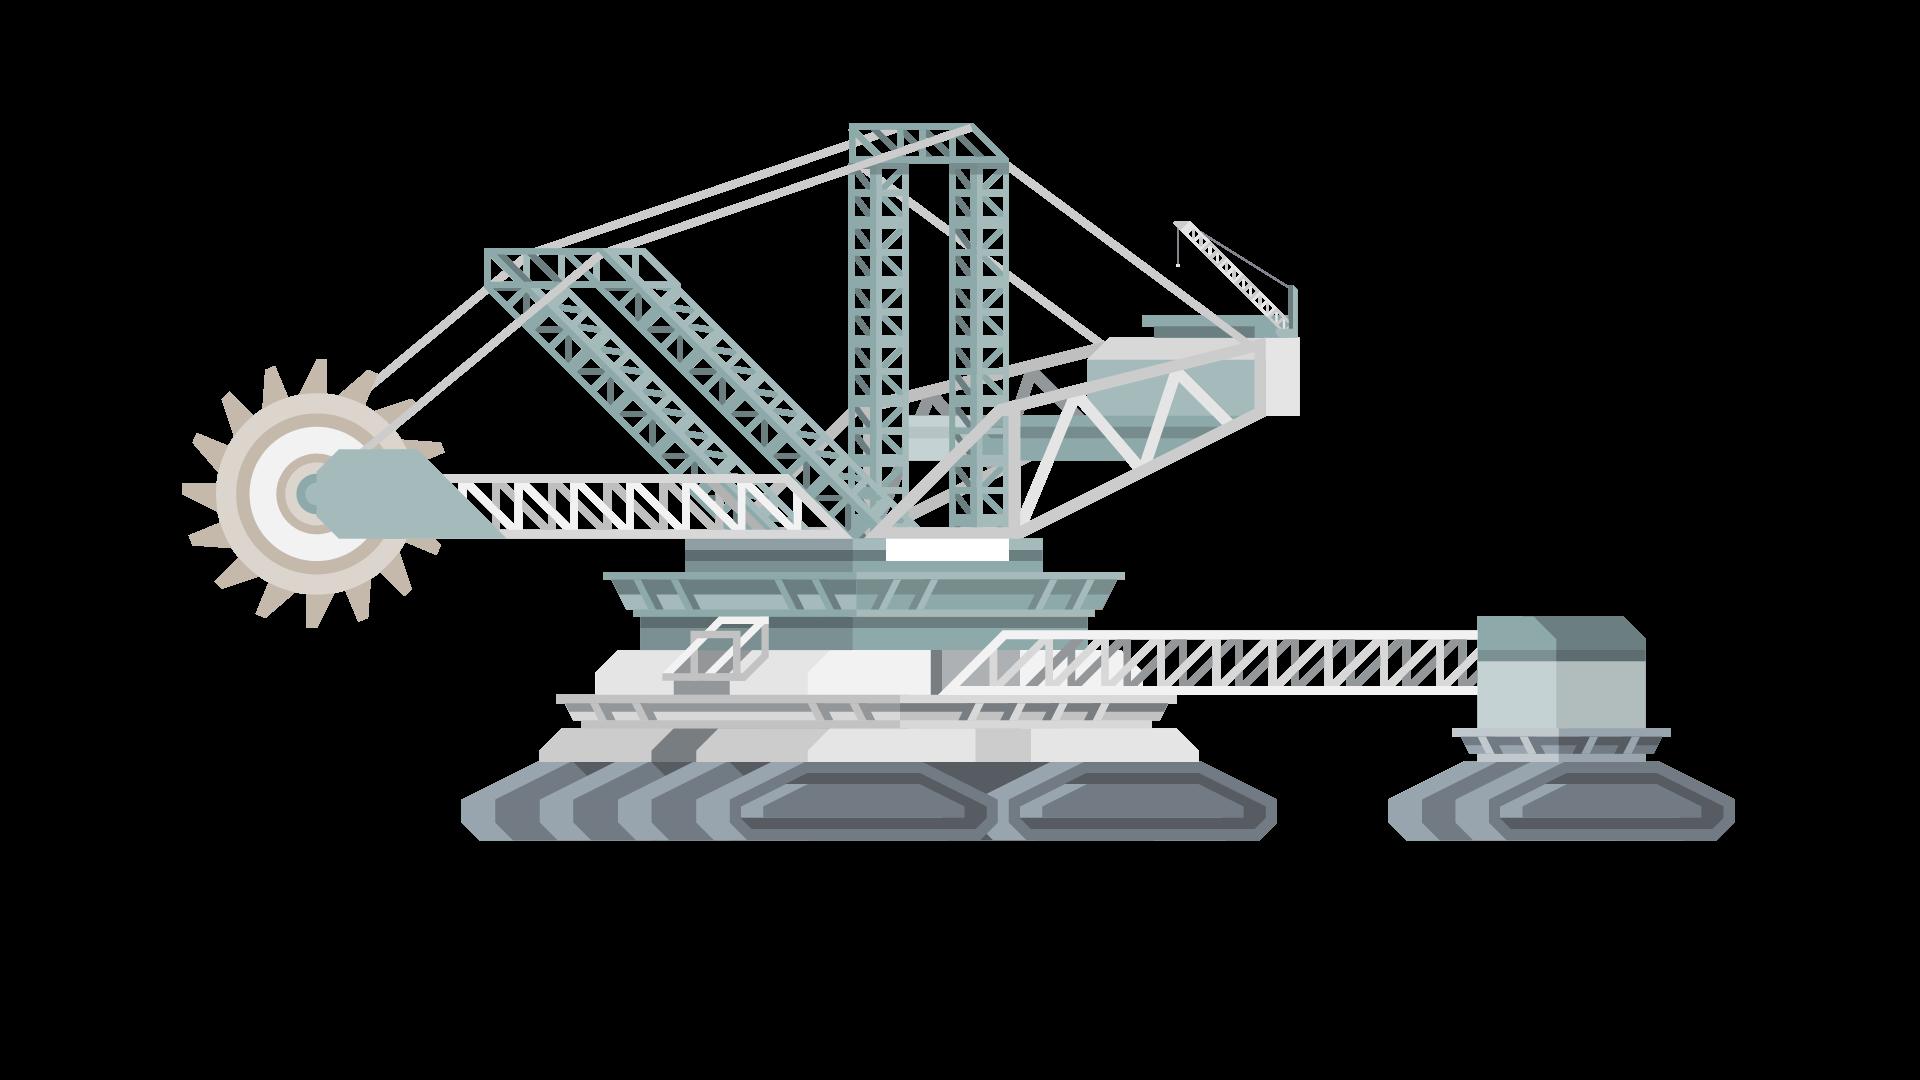 240_Website Technical Illustrations_Kurzgesagt Header